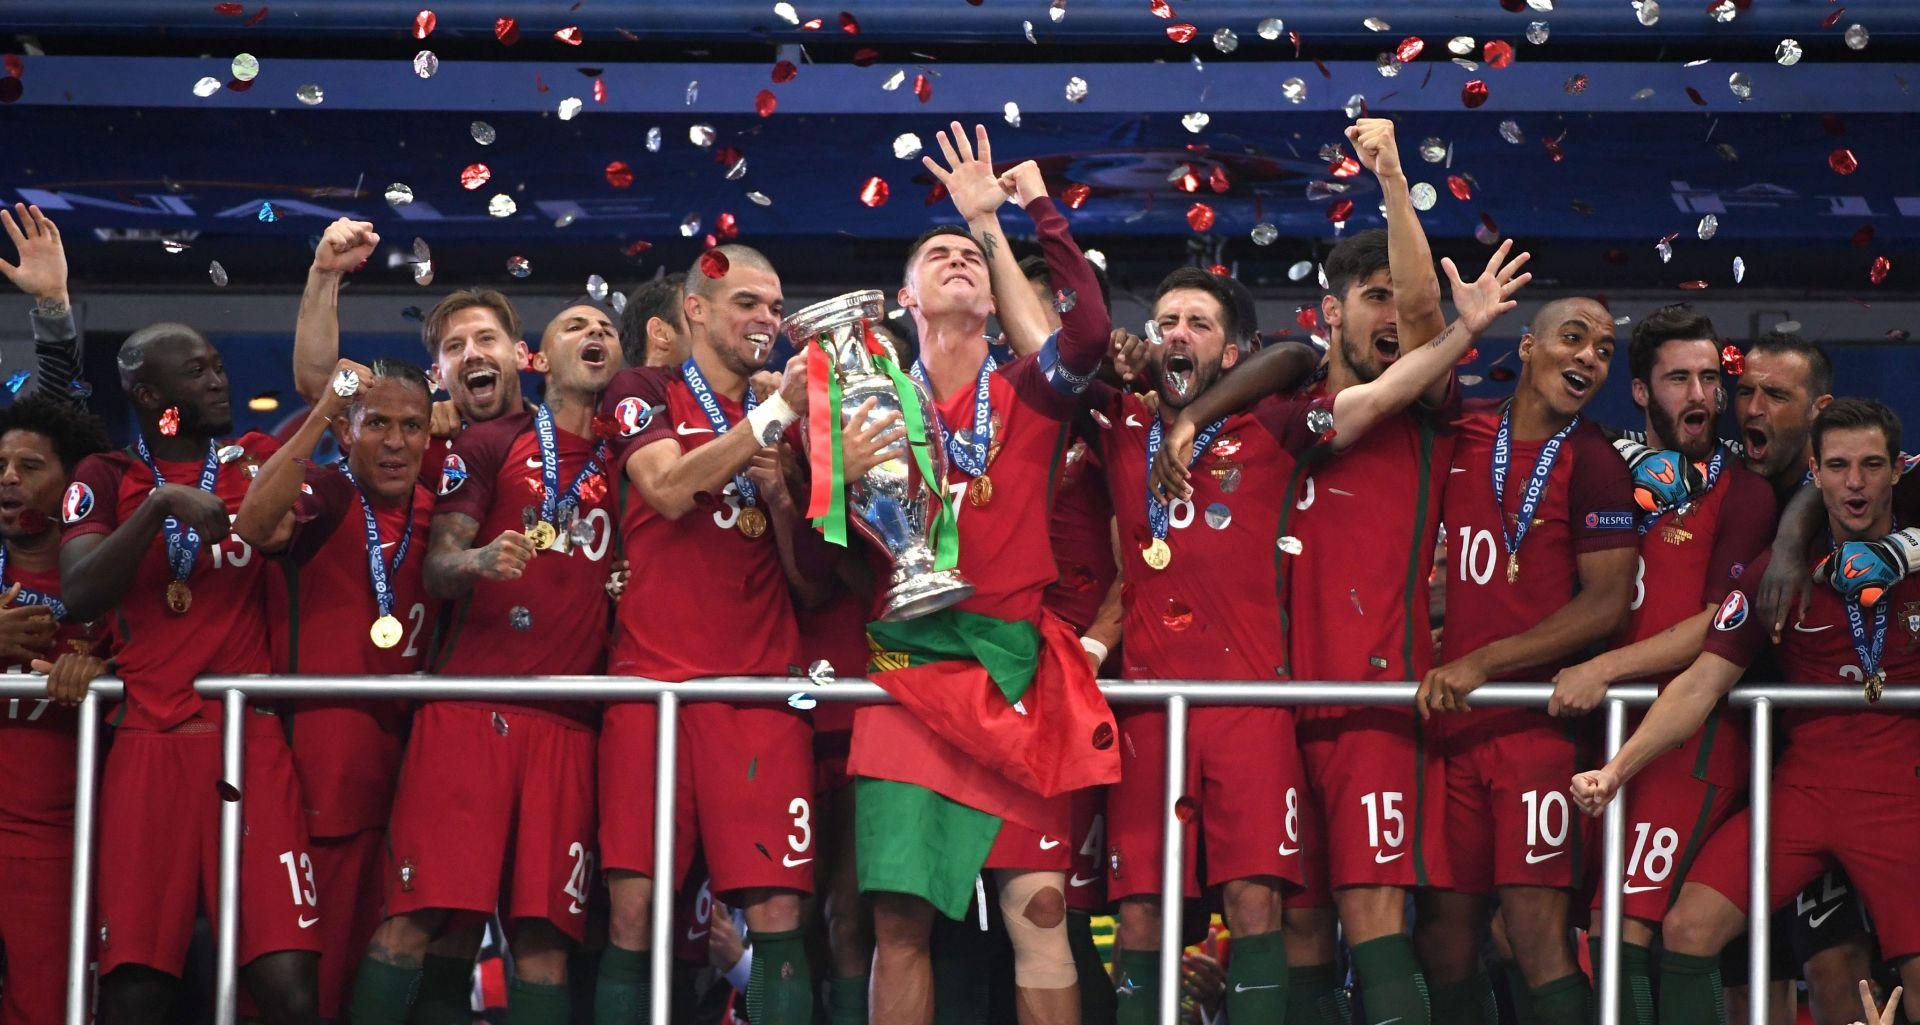 VIDEO: EDÉR 'NOKAUTIRAO' DOMAĆINE Portugal osvojio naslov europskog prvaka!